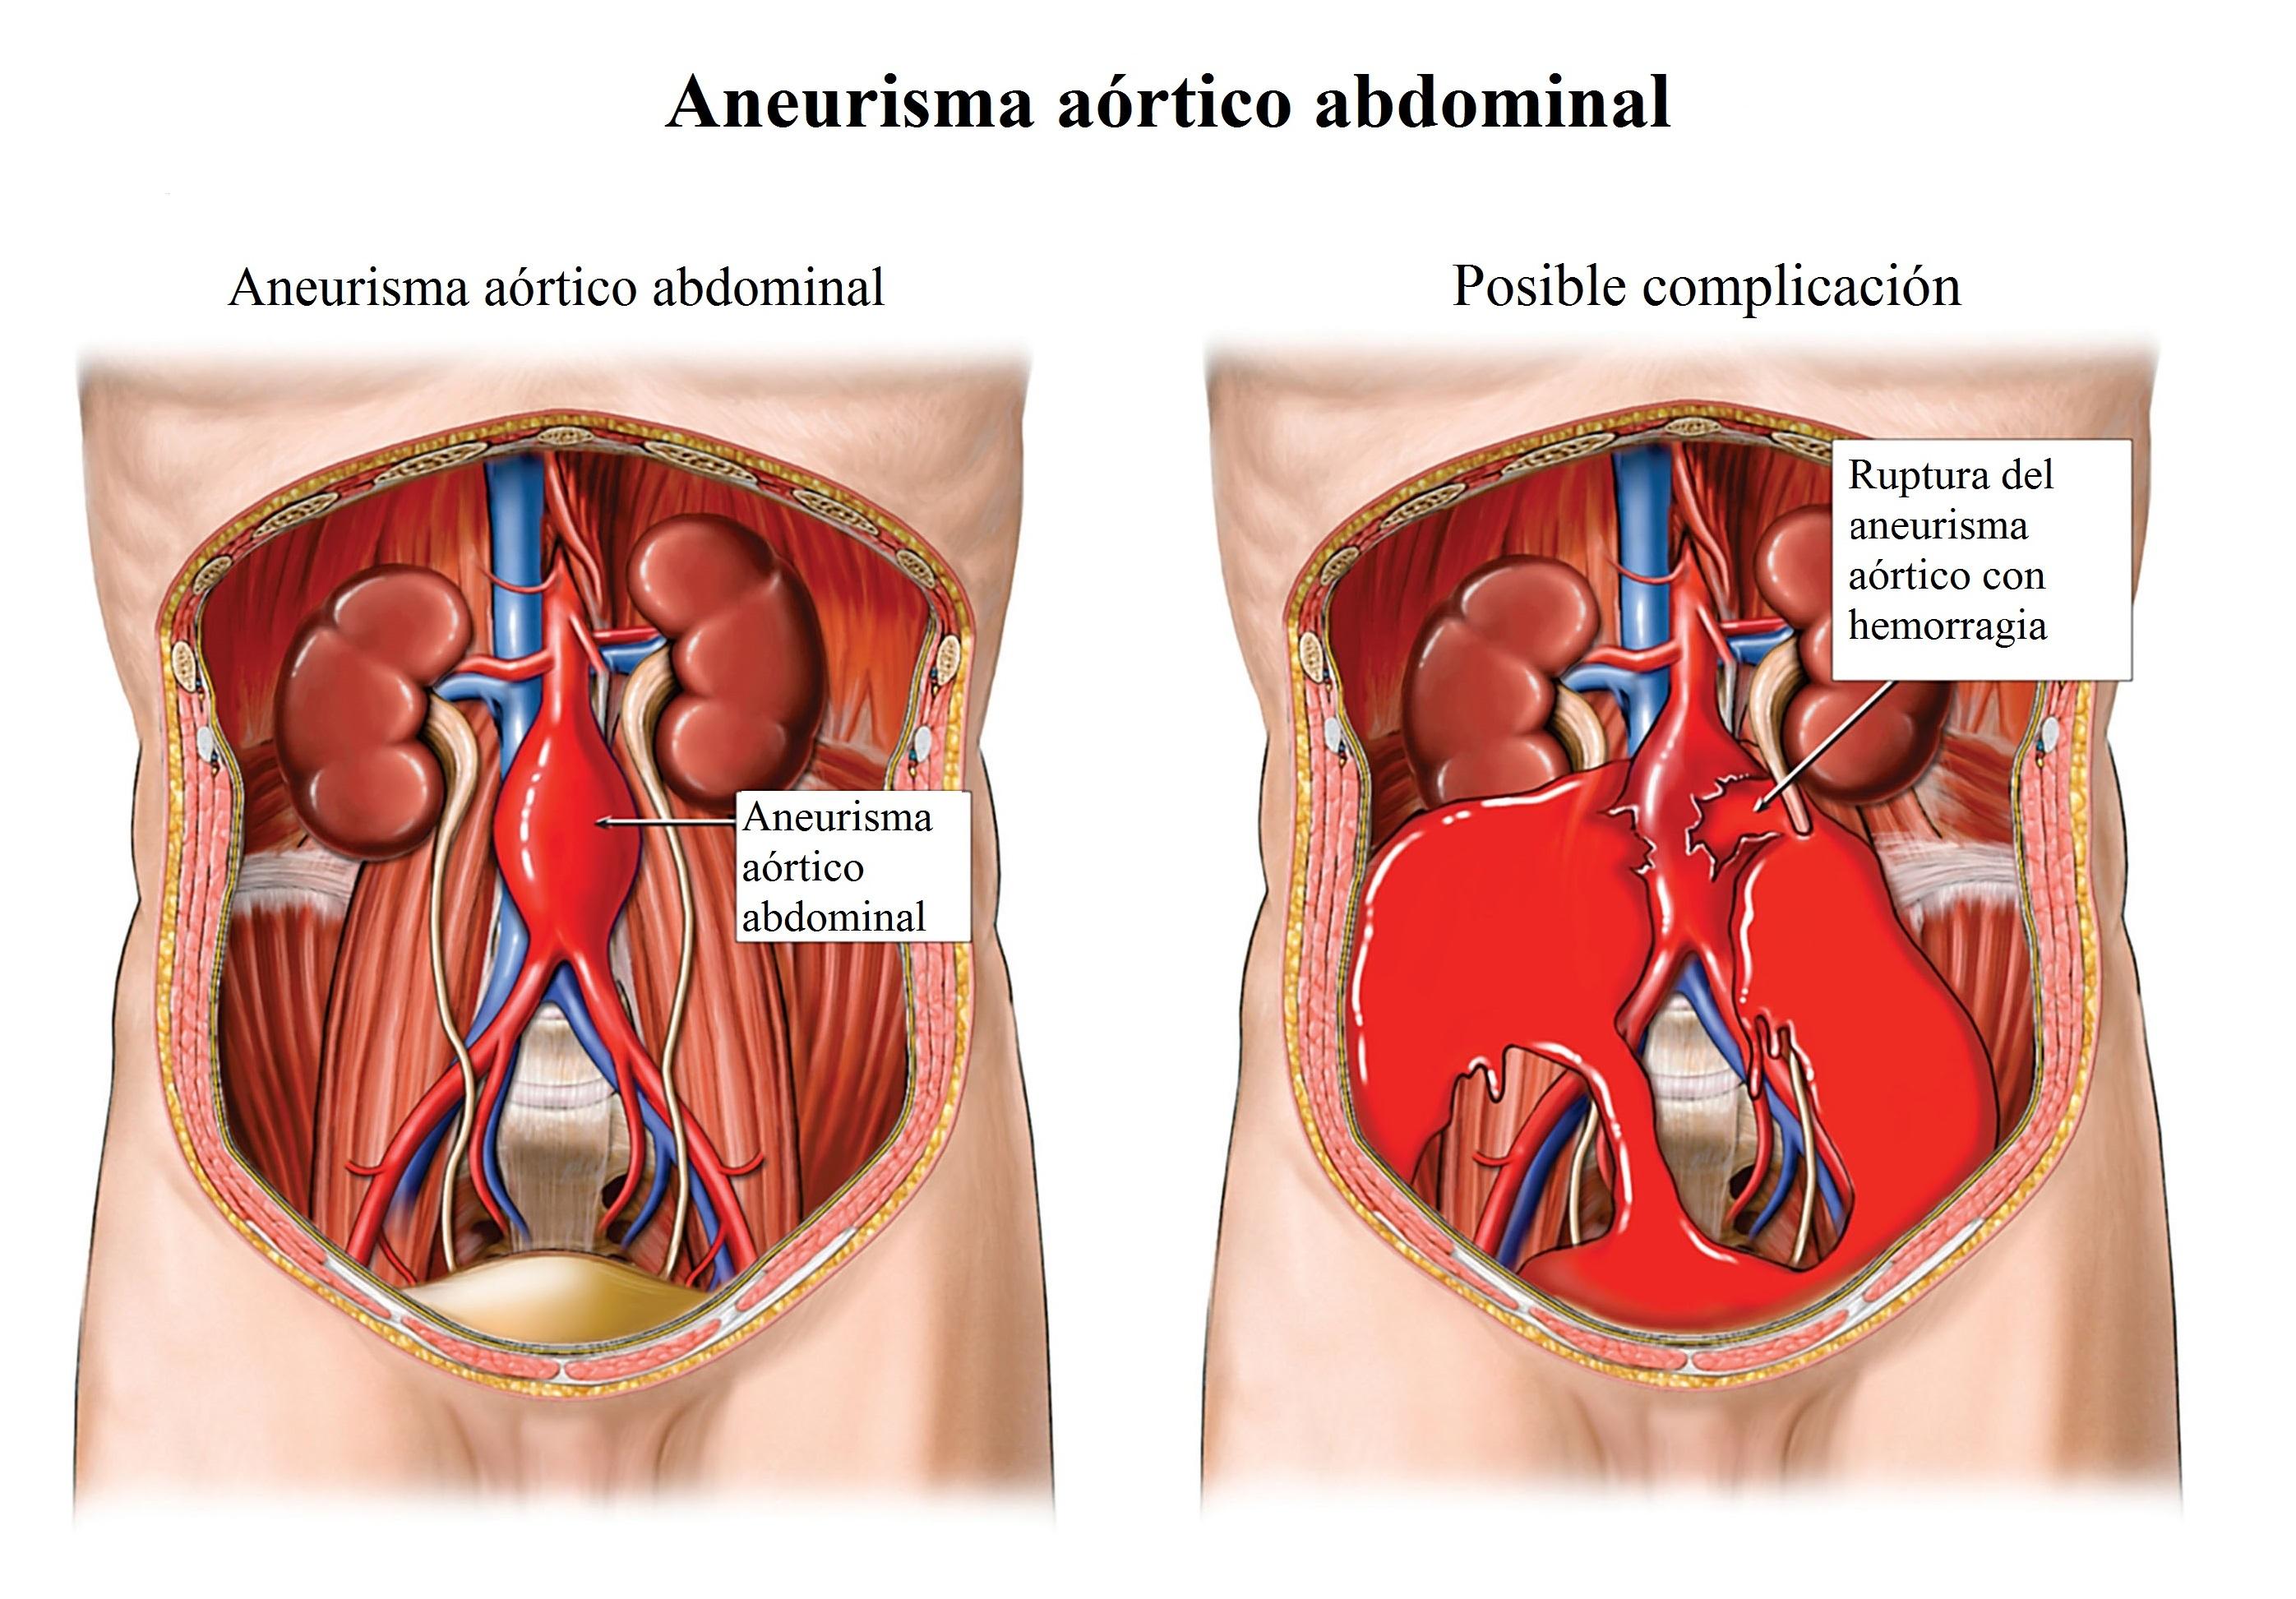 ADTTRE Abdominal Aortic Aneurysm, Rupture with Internal Hemorrhaging (Bleeding)